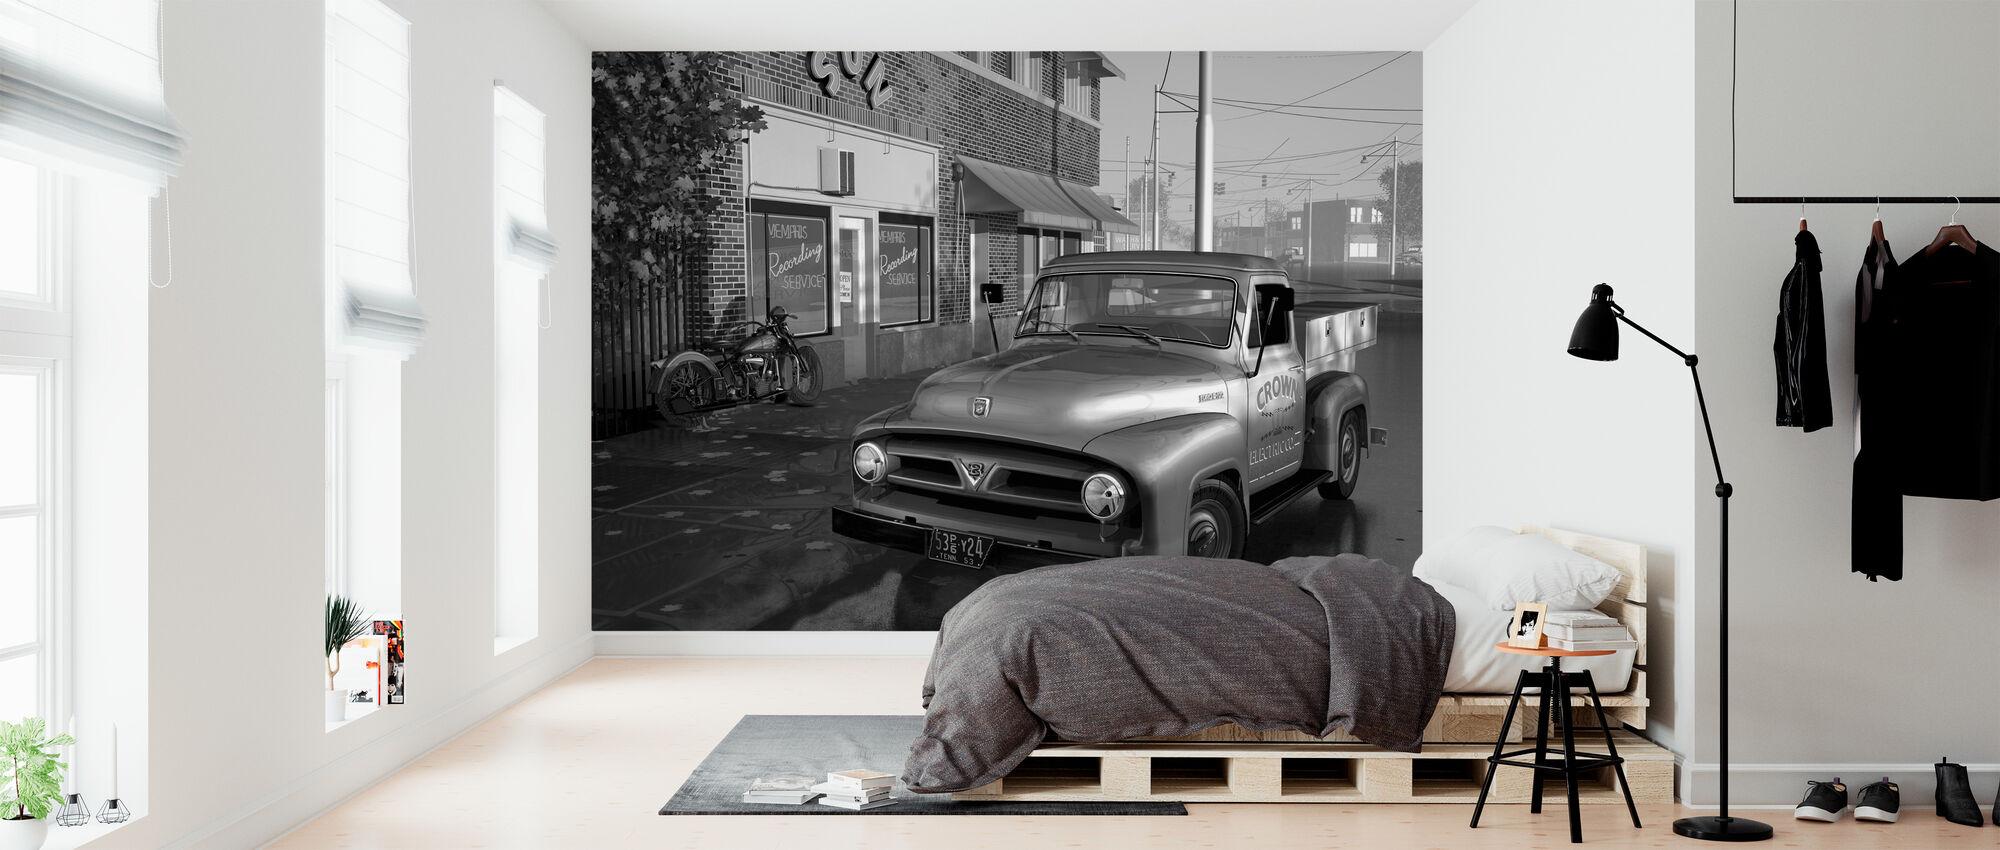 Truck BW - Wallpaper - Bedroom